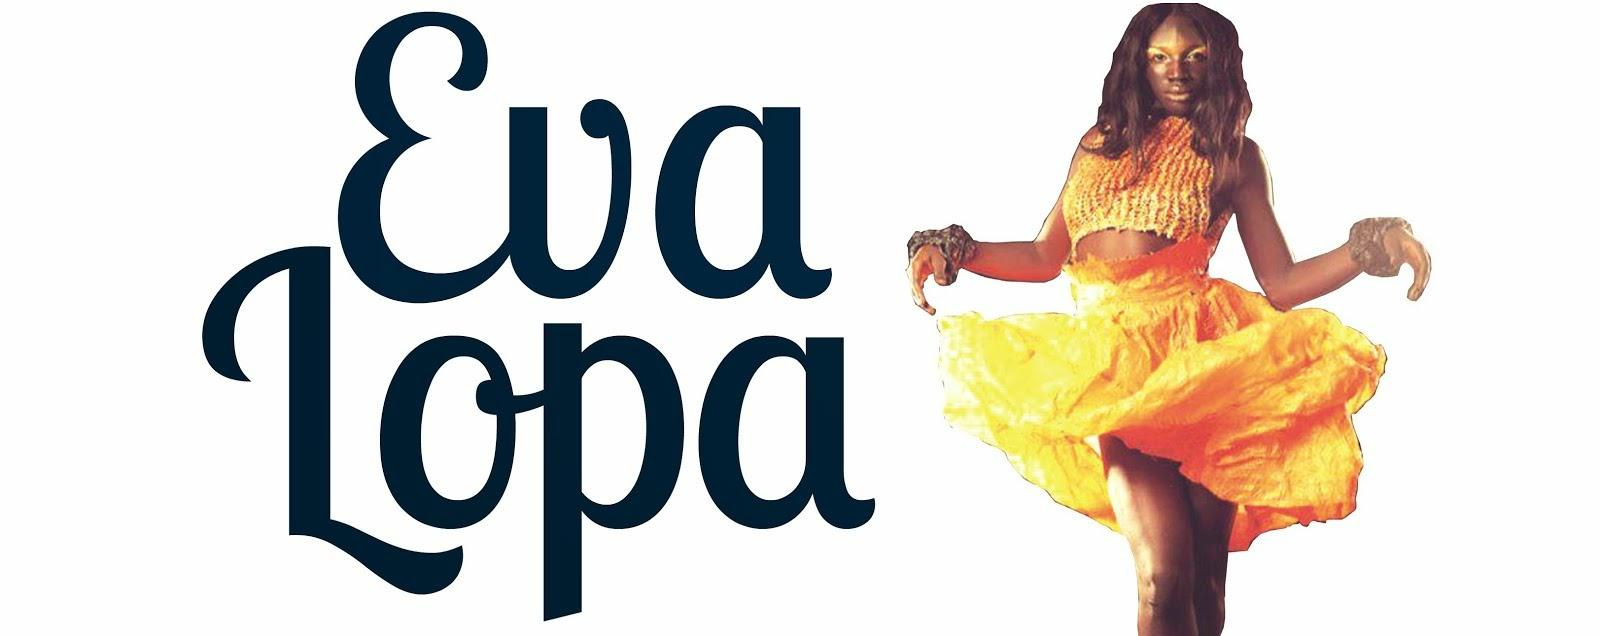 Eva Lopa